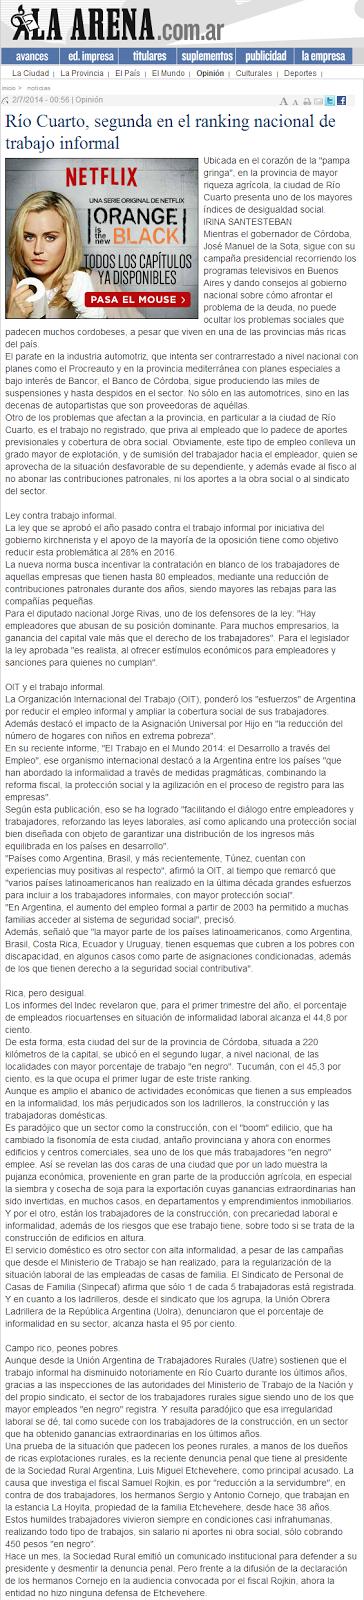 http://2.bp.blogspot.com/-00GJnVw_37Q/U7PgQLEYDAI/AAAAAAAAEfE/G54PK6ybN9s/s1600/rivas+La+Pampa+++R%C3%ADo+Cuarto++segunda+en+el+ranking+nacional+de+trabajo+informal.png